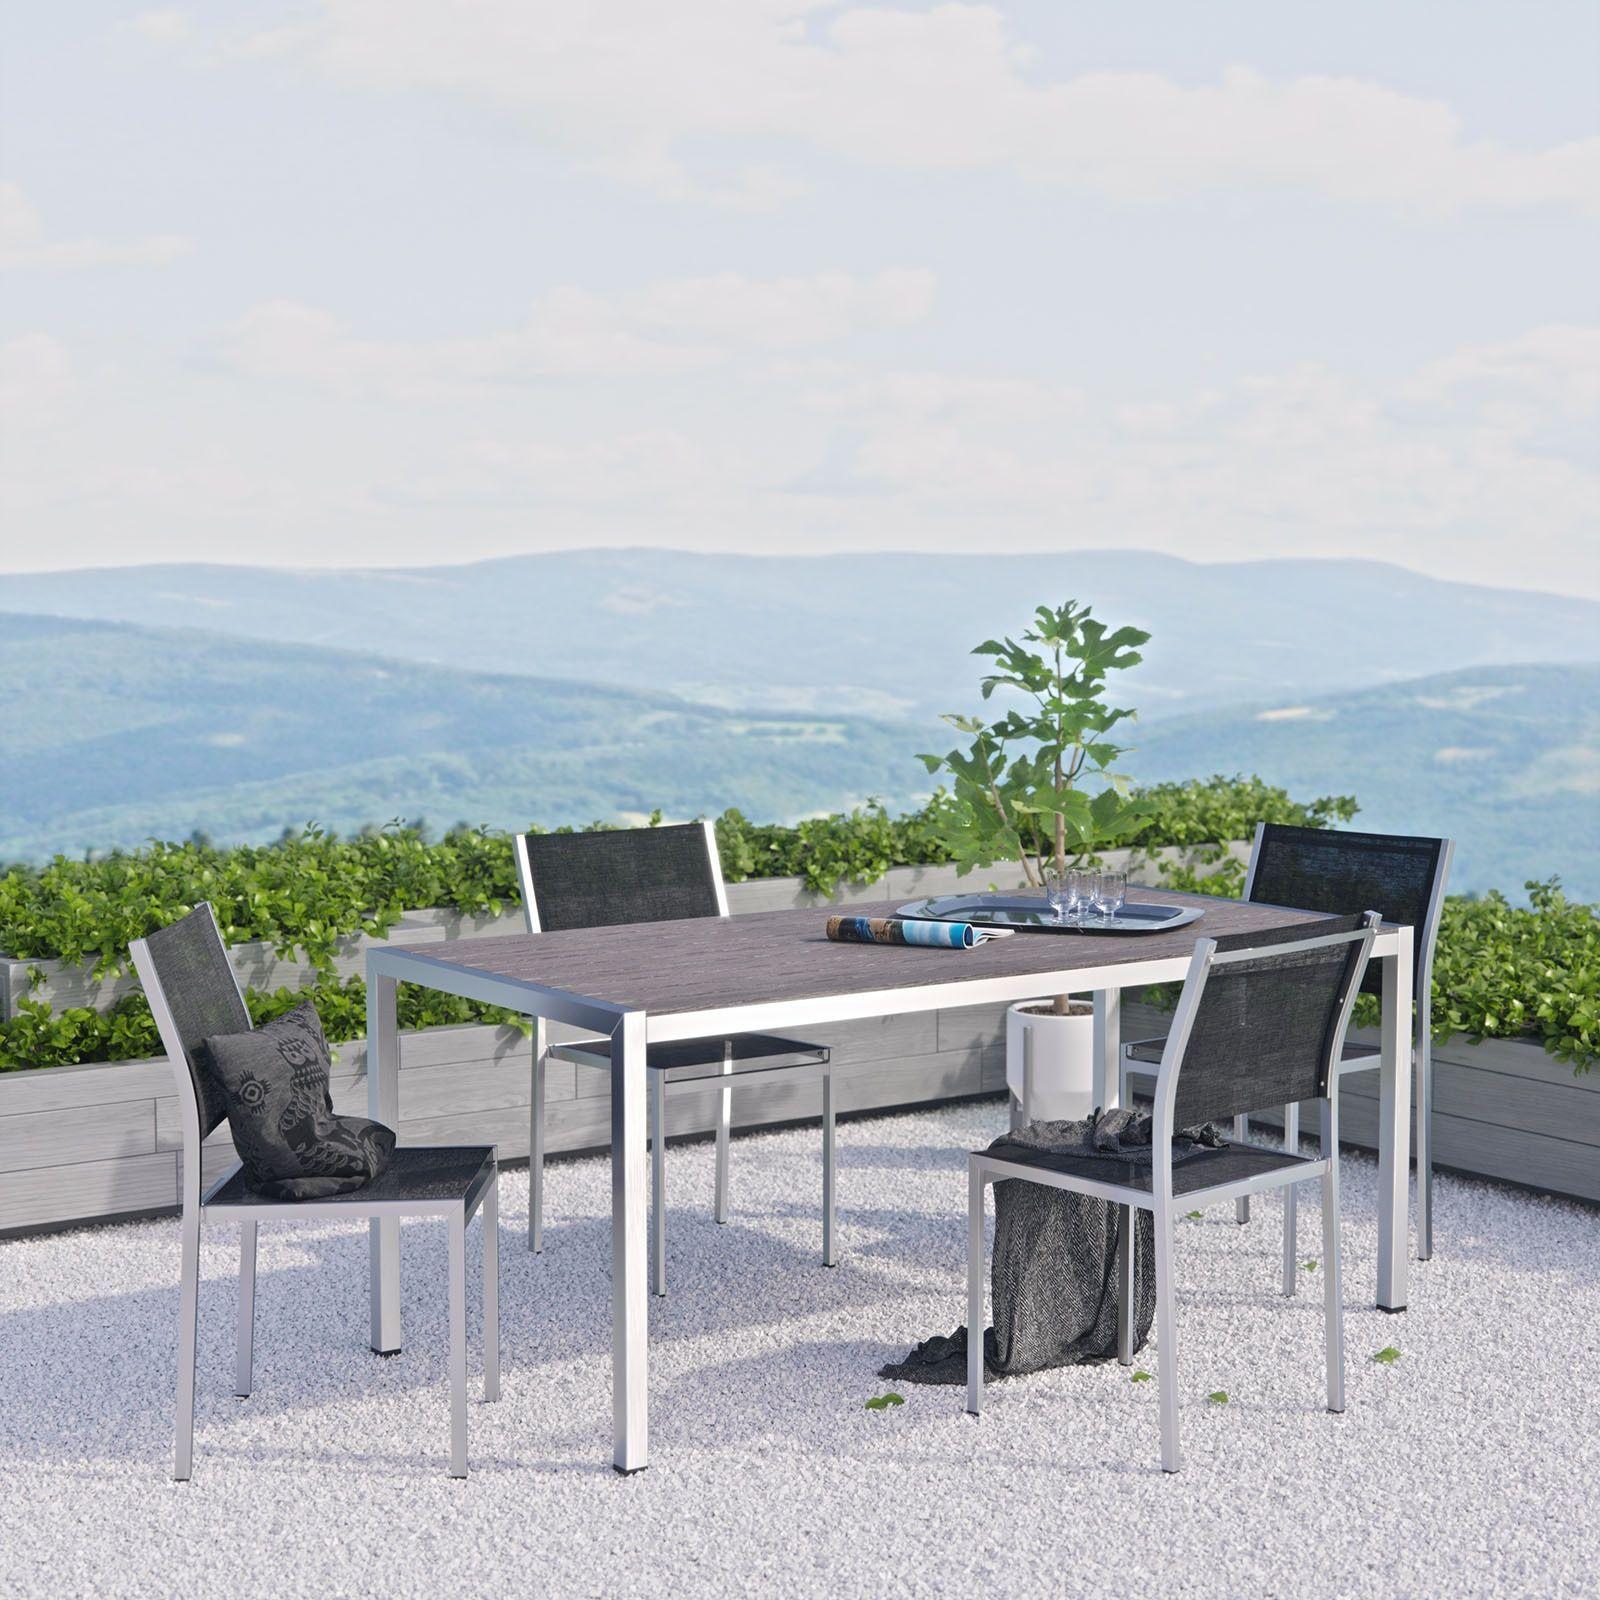 Modway Shore 5 Piece Outdoor Patio Aluminum Dining Set (Silver Black), Size 5-Piece Sets, Patio Furniture